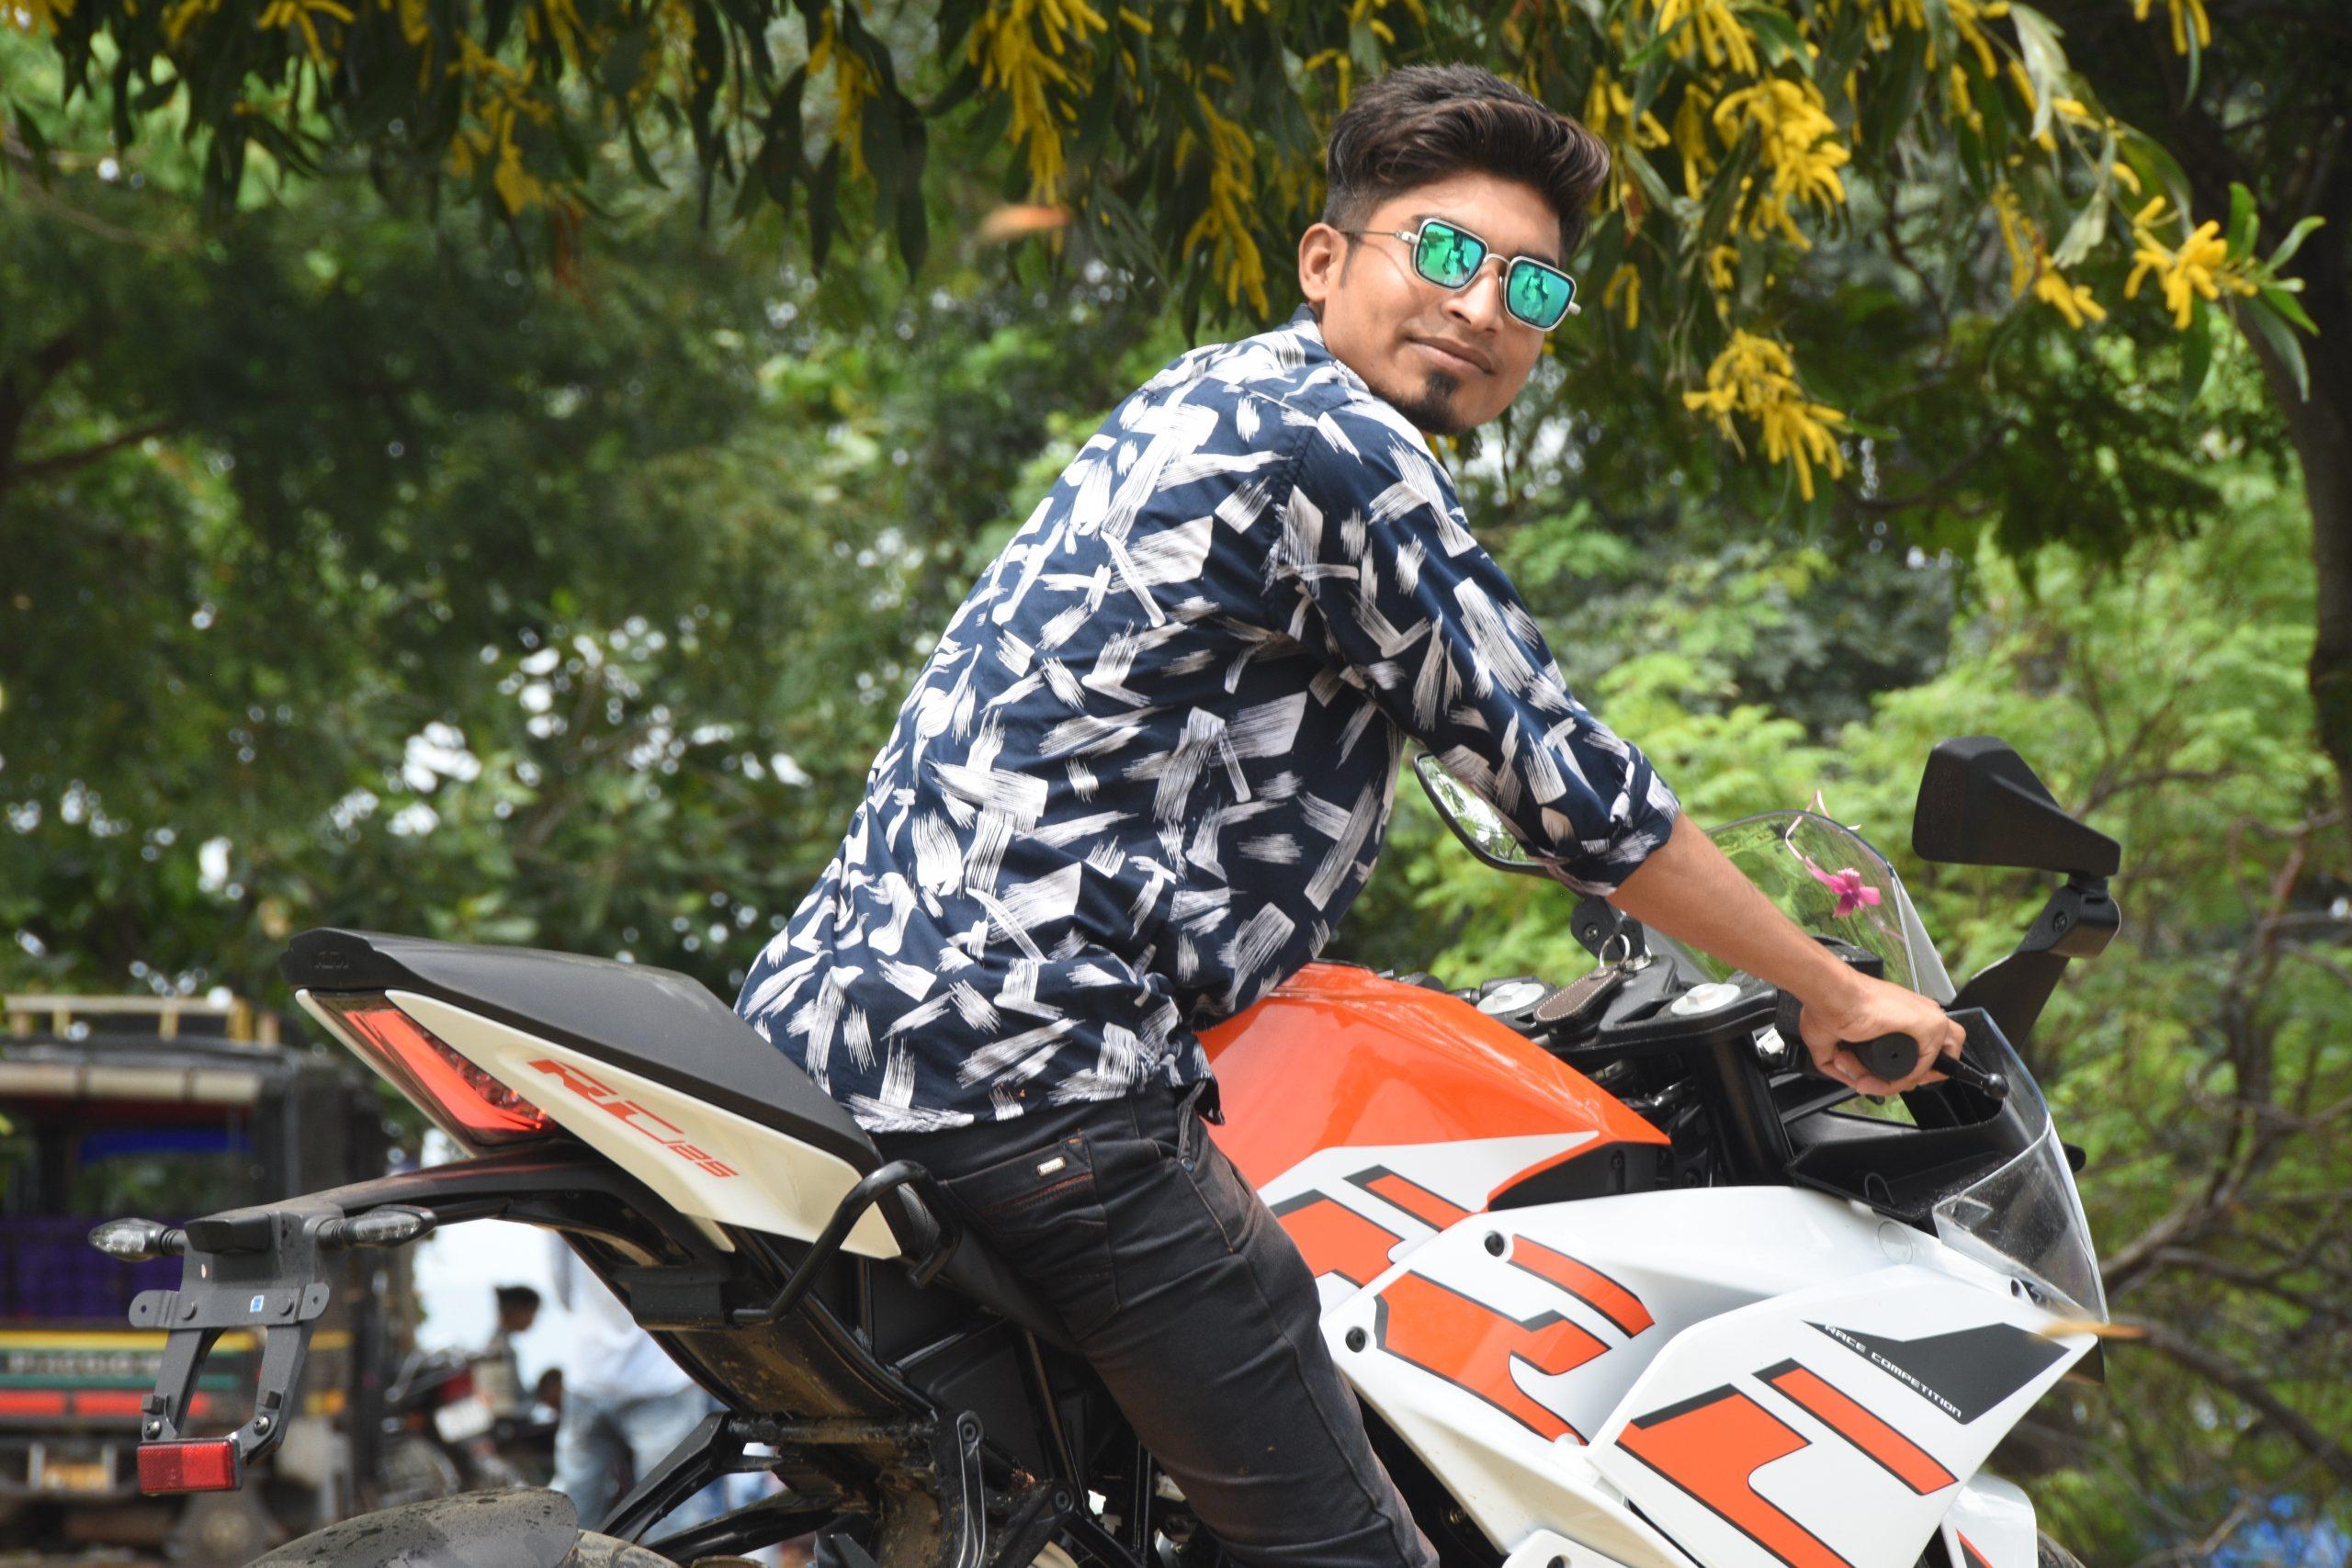 Boy on KTM bike